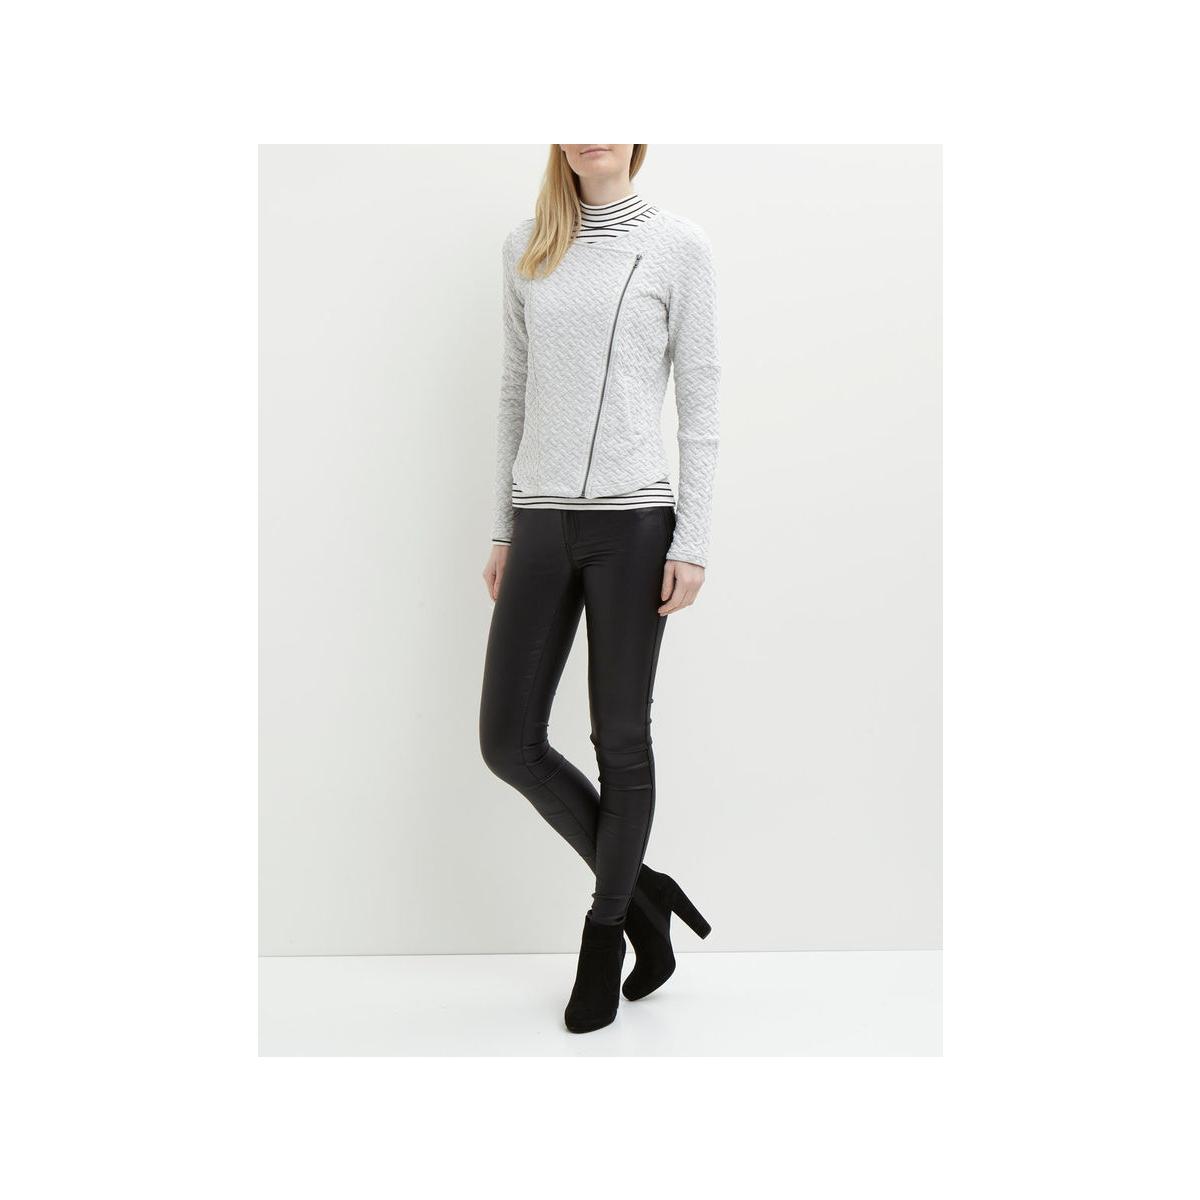 objcamden courtney l/s blazer noos 23023817 object vest light grey melange